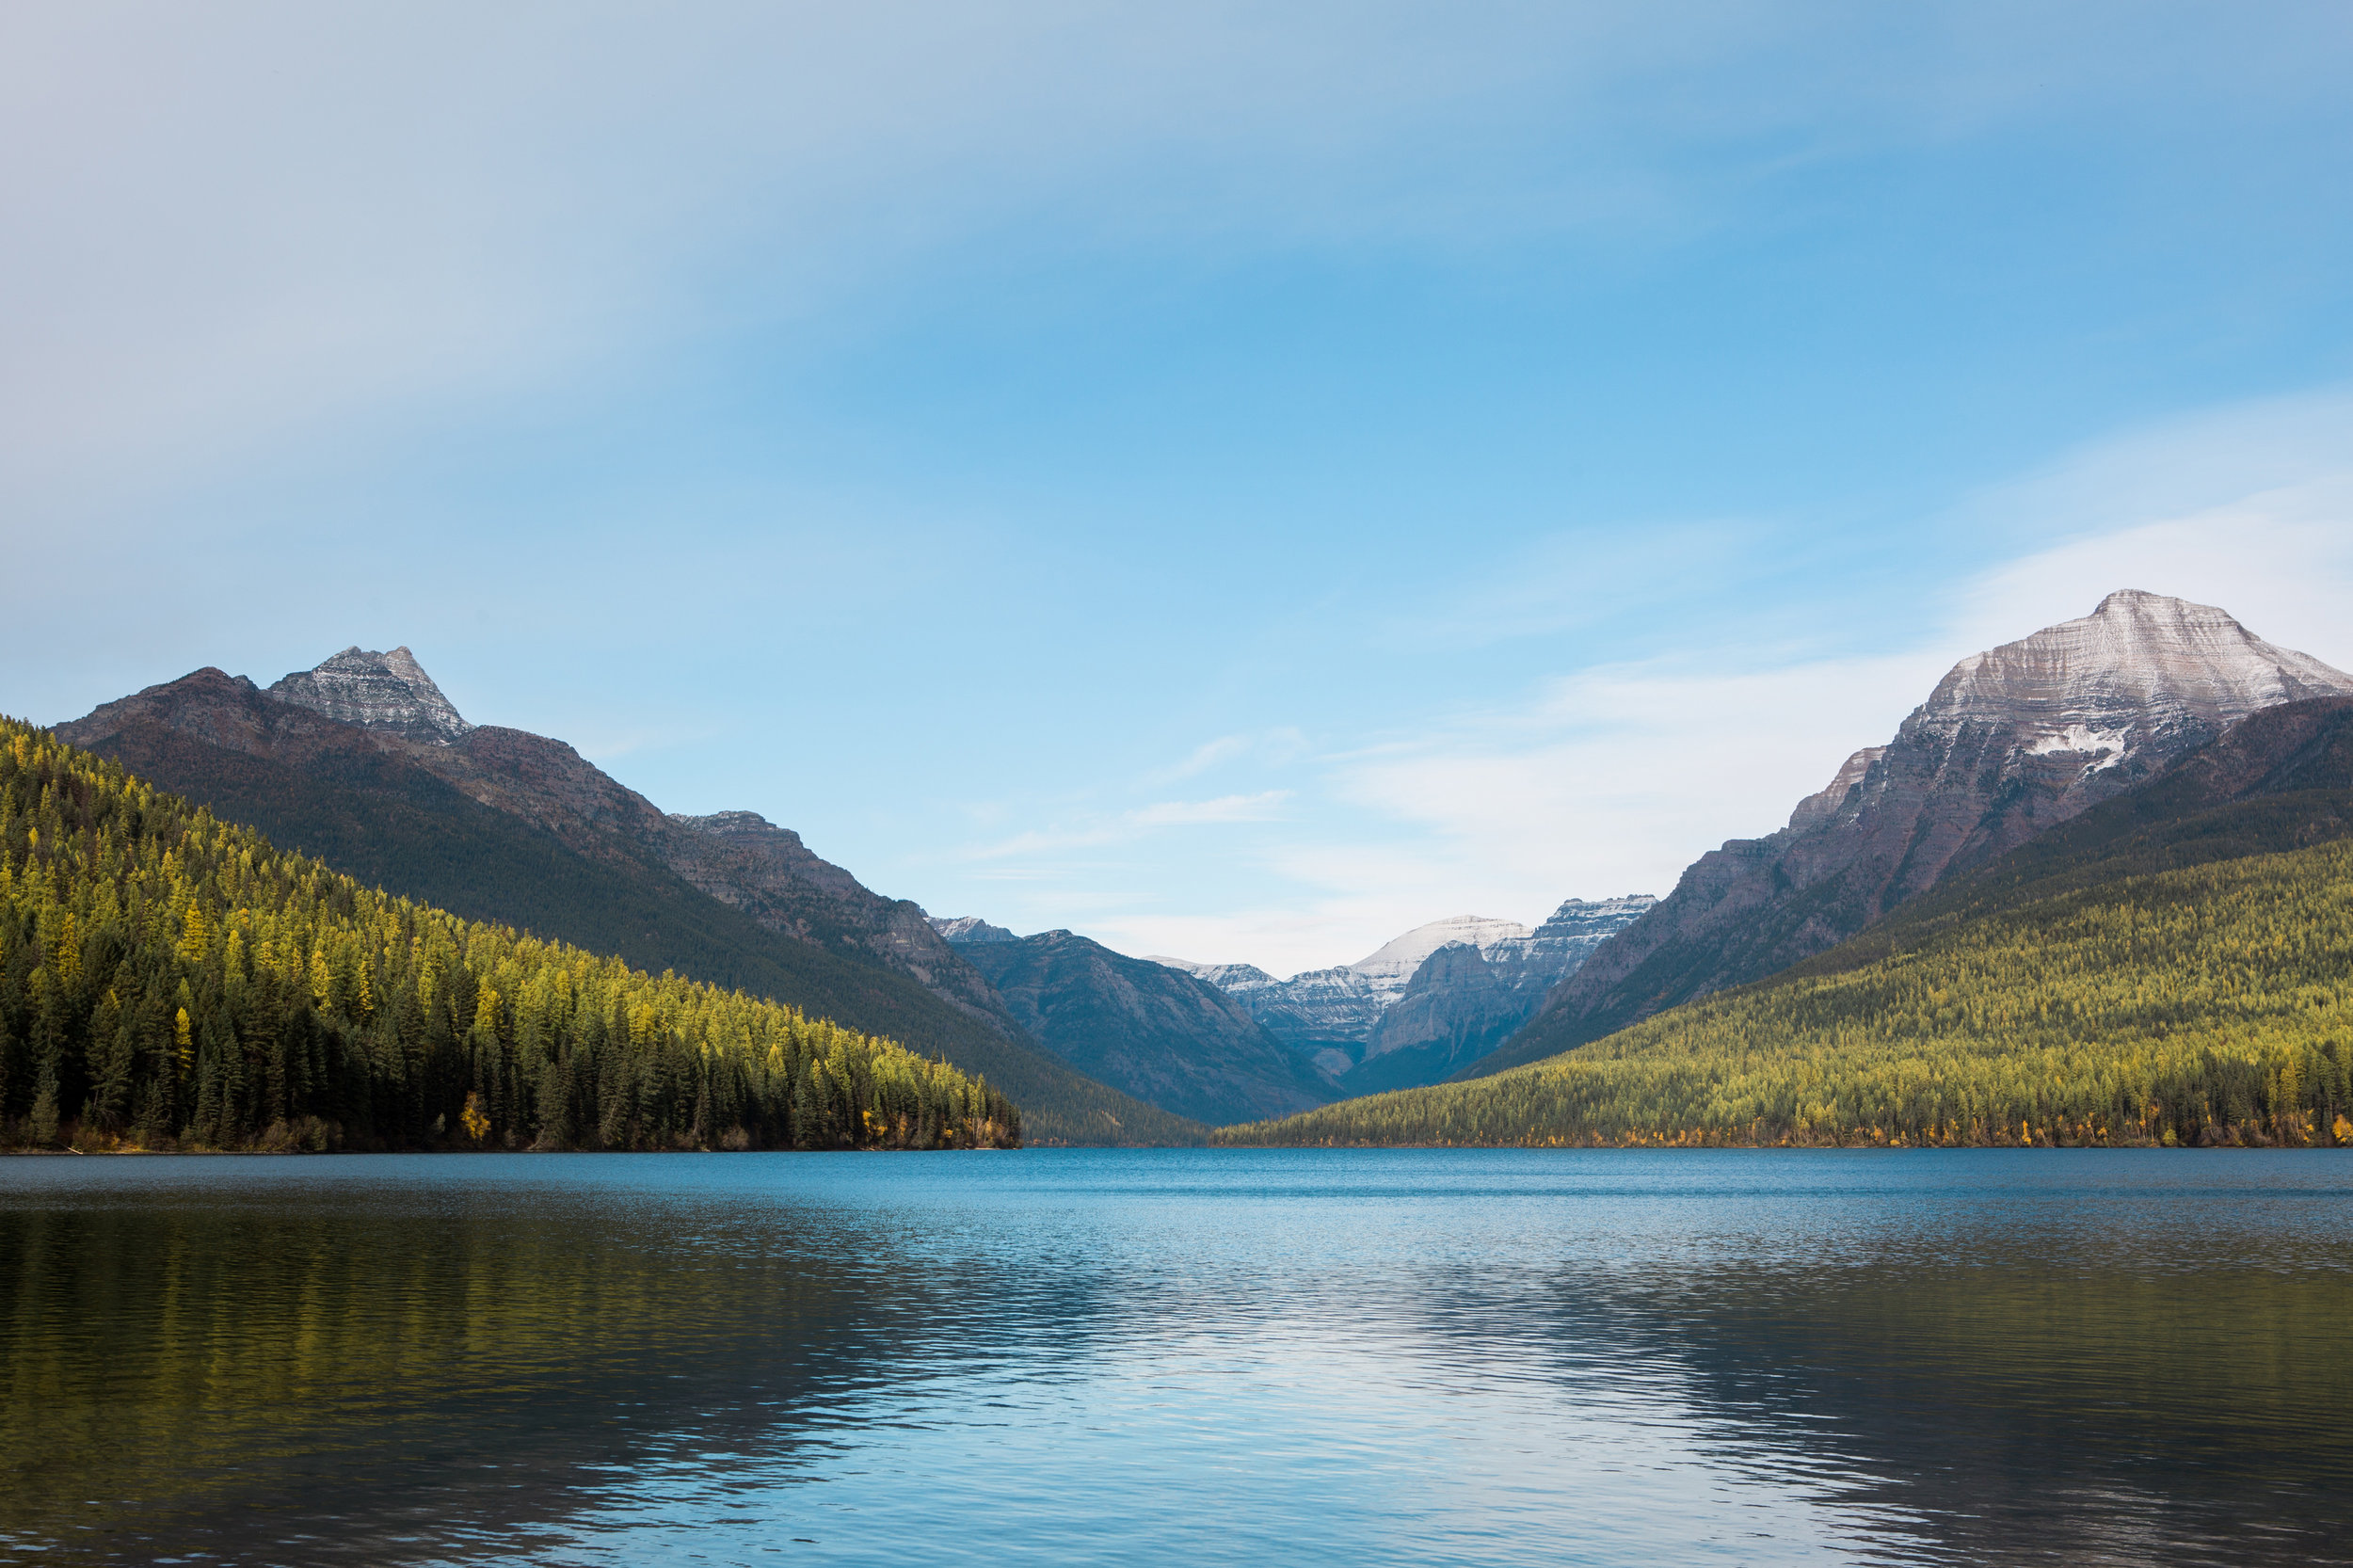 CindyGiovagnoli_outdoor_adventure_photography_Grand_Teton_Yellowstone_Glacier_National_Park_Montana_Wyoming_South_Dakota_Mount_Rushmore_Badlands-001.jpg